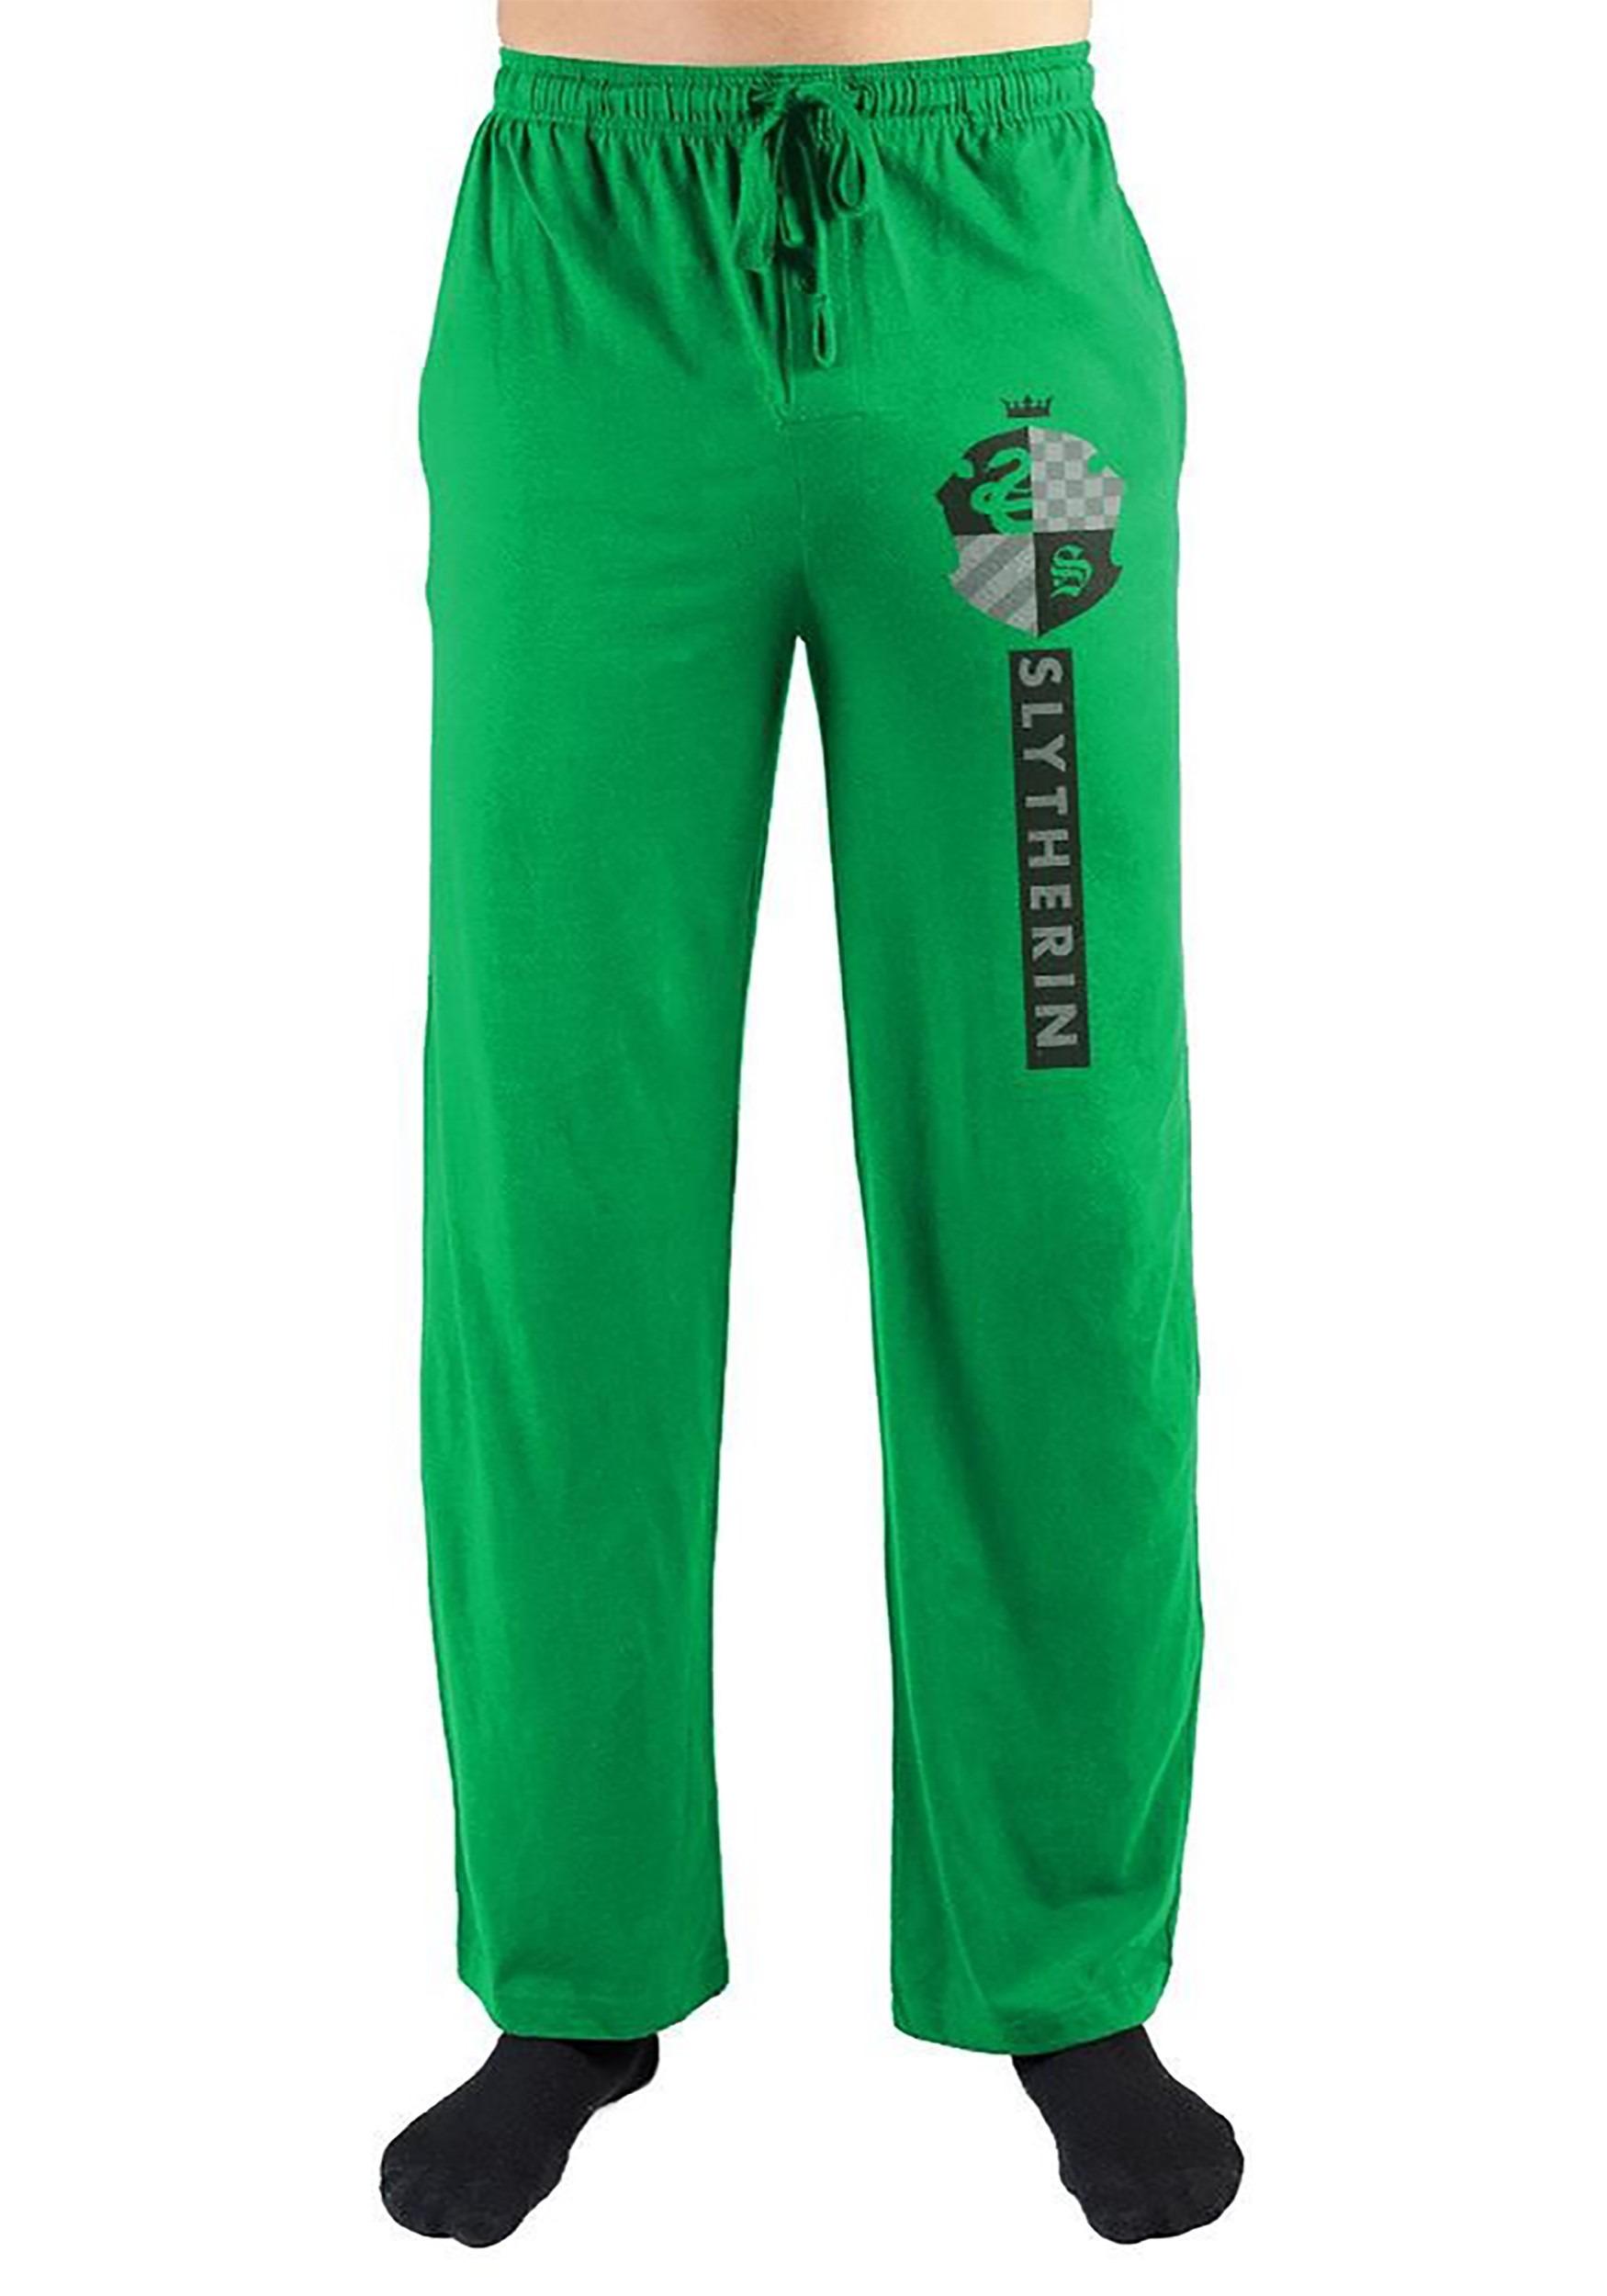 Slytherin Adult Sleep Pants